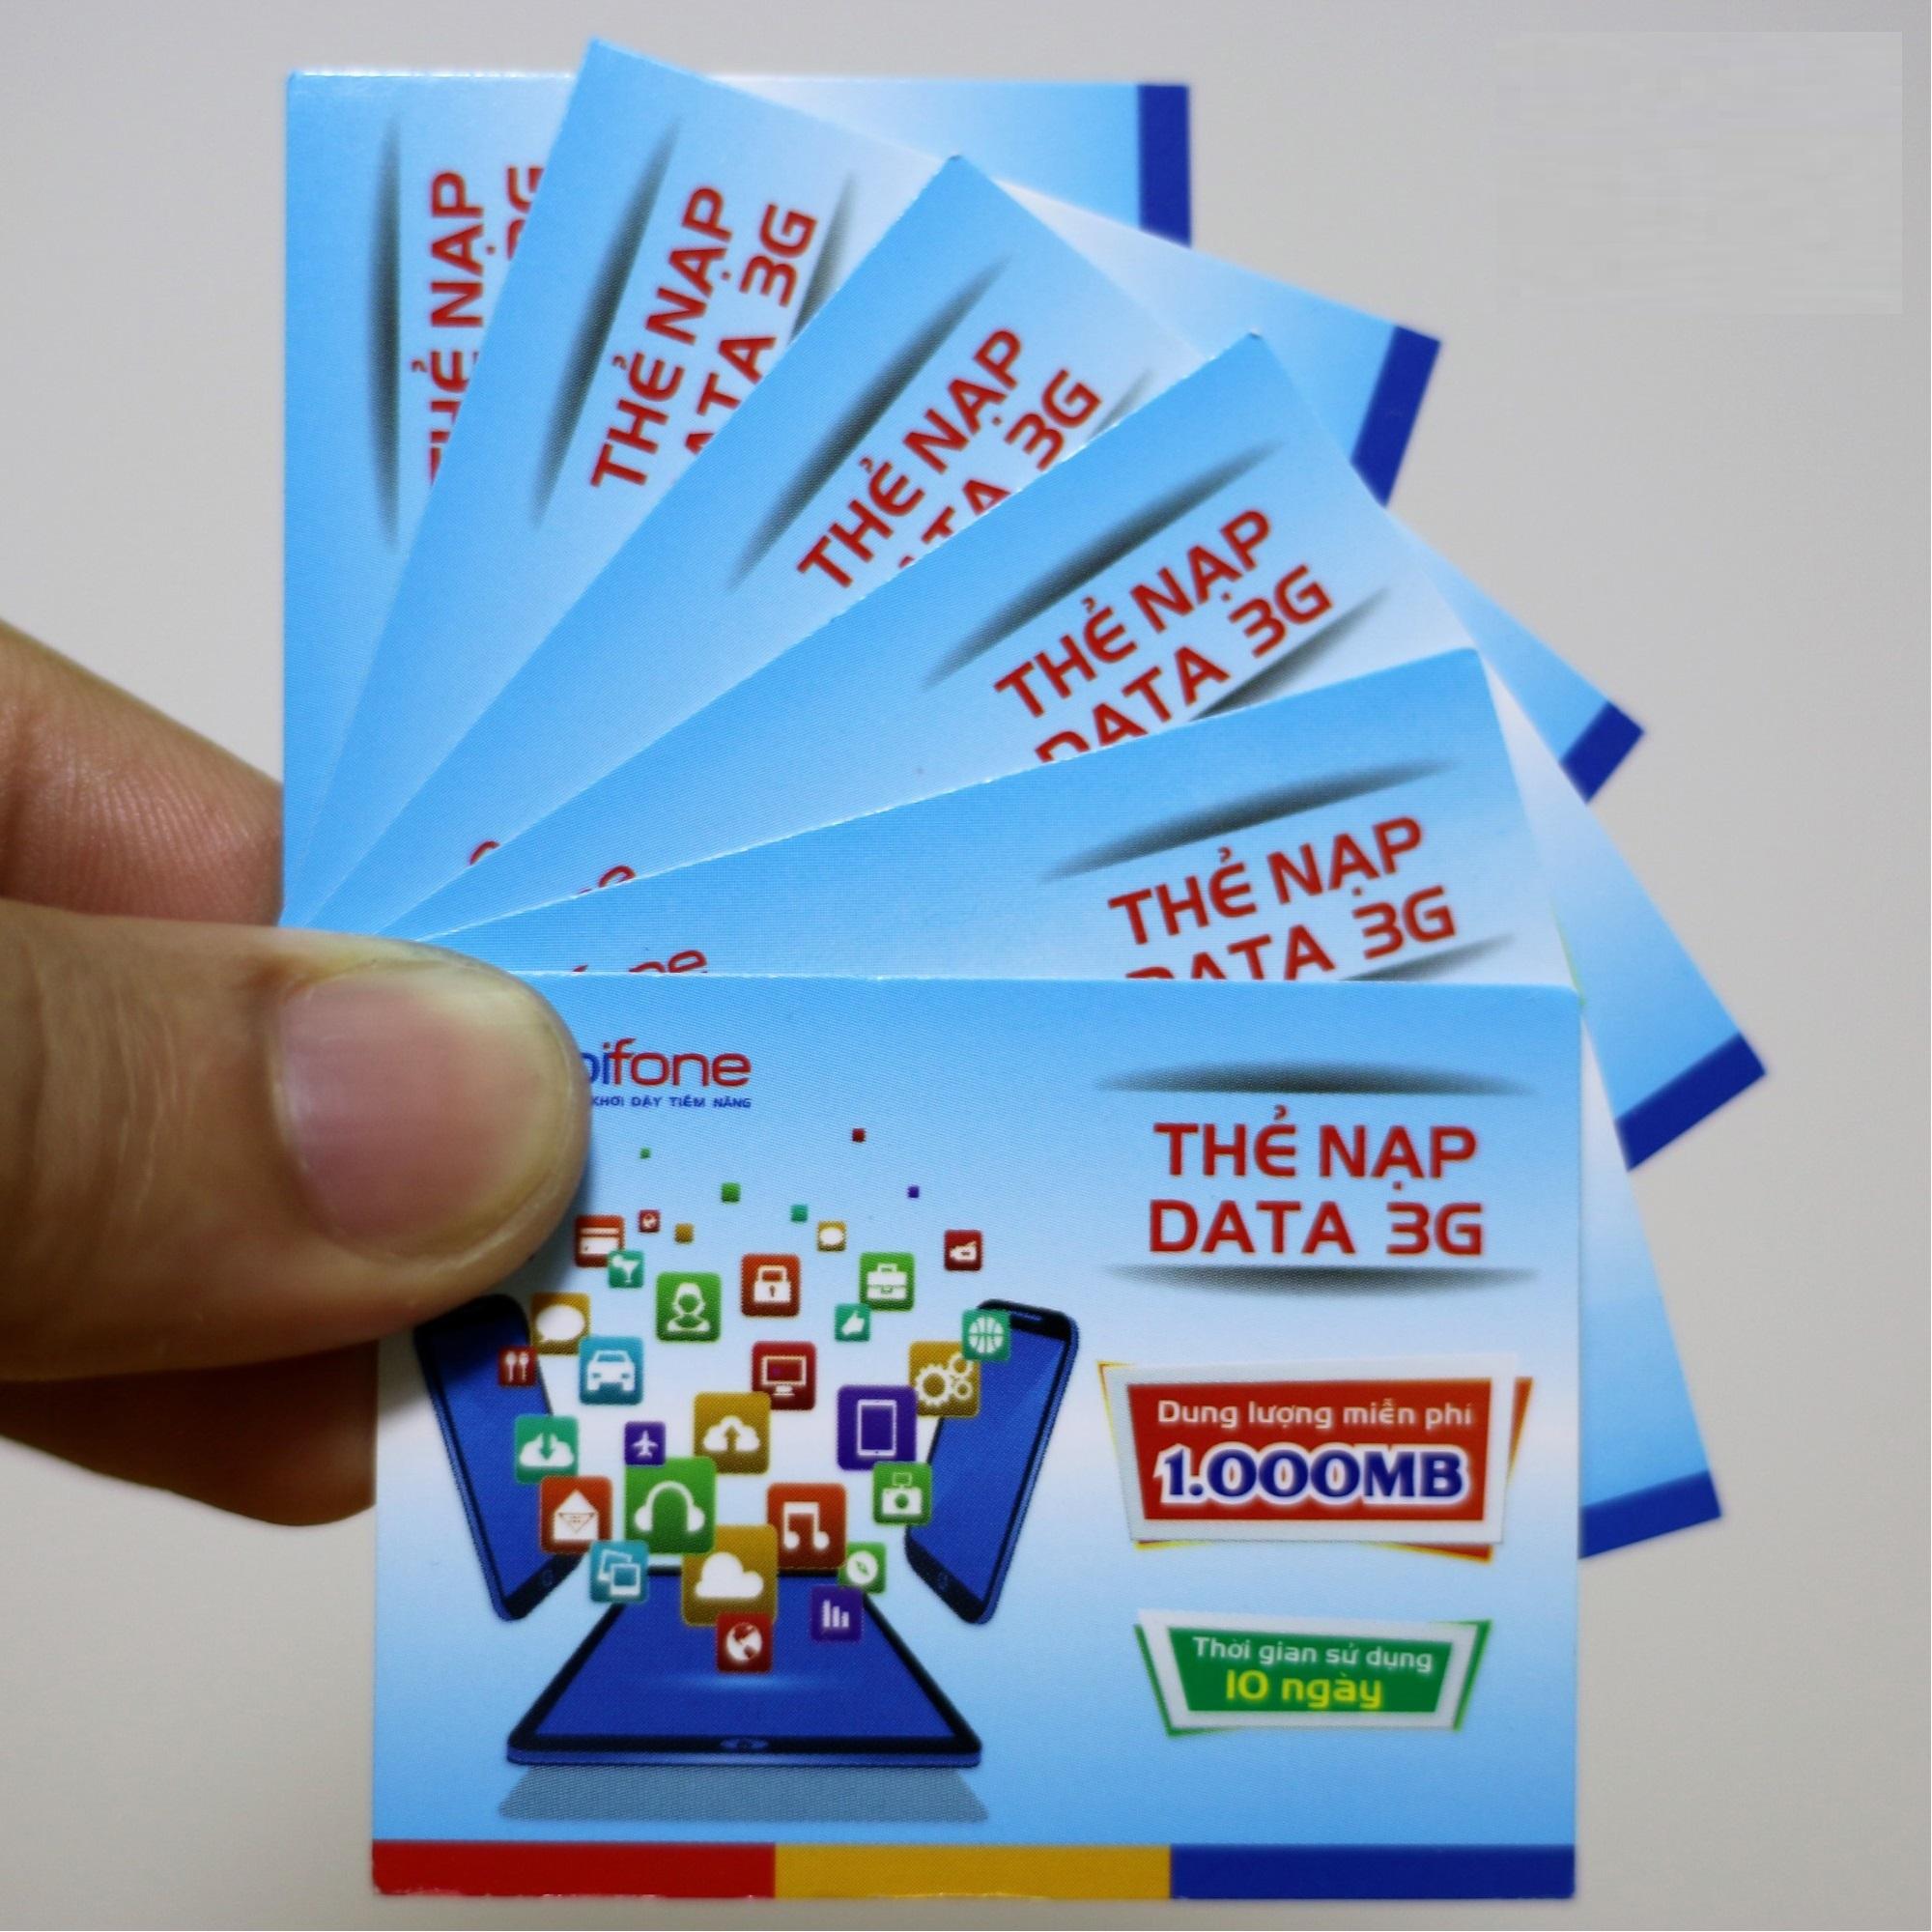 the-data-3g-mobifone